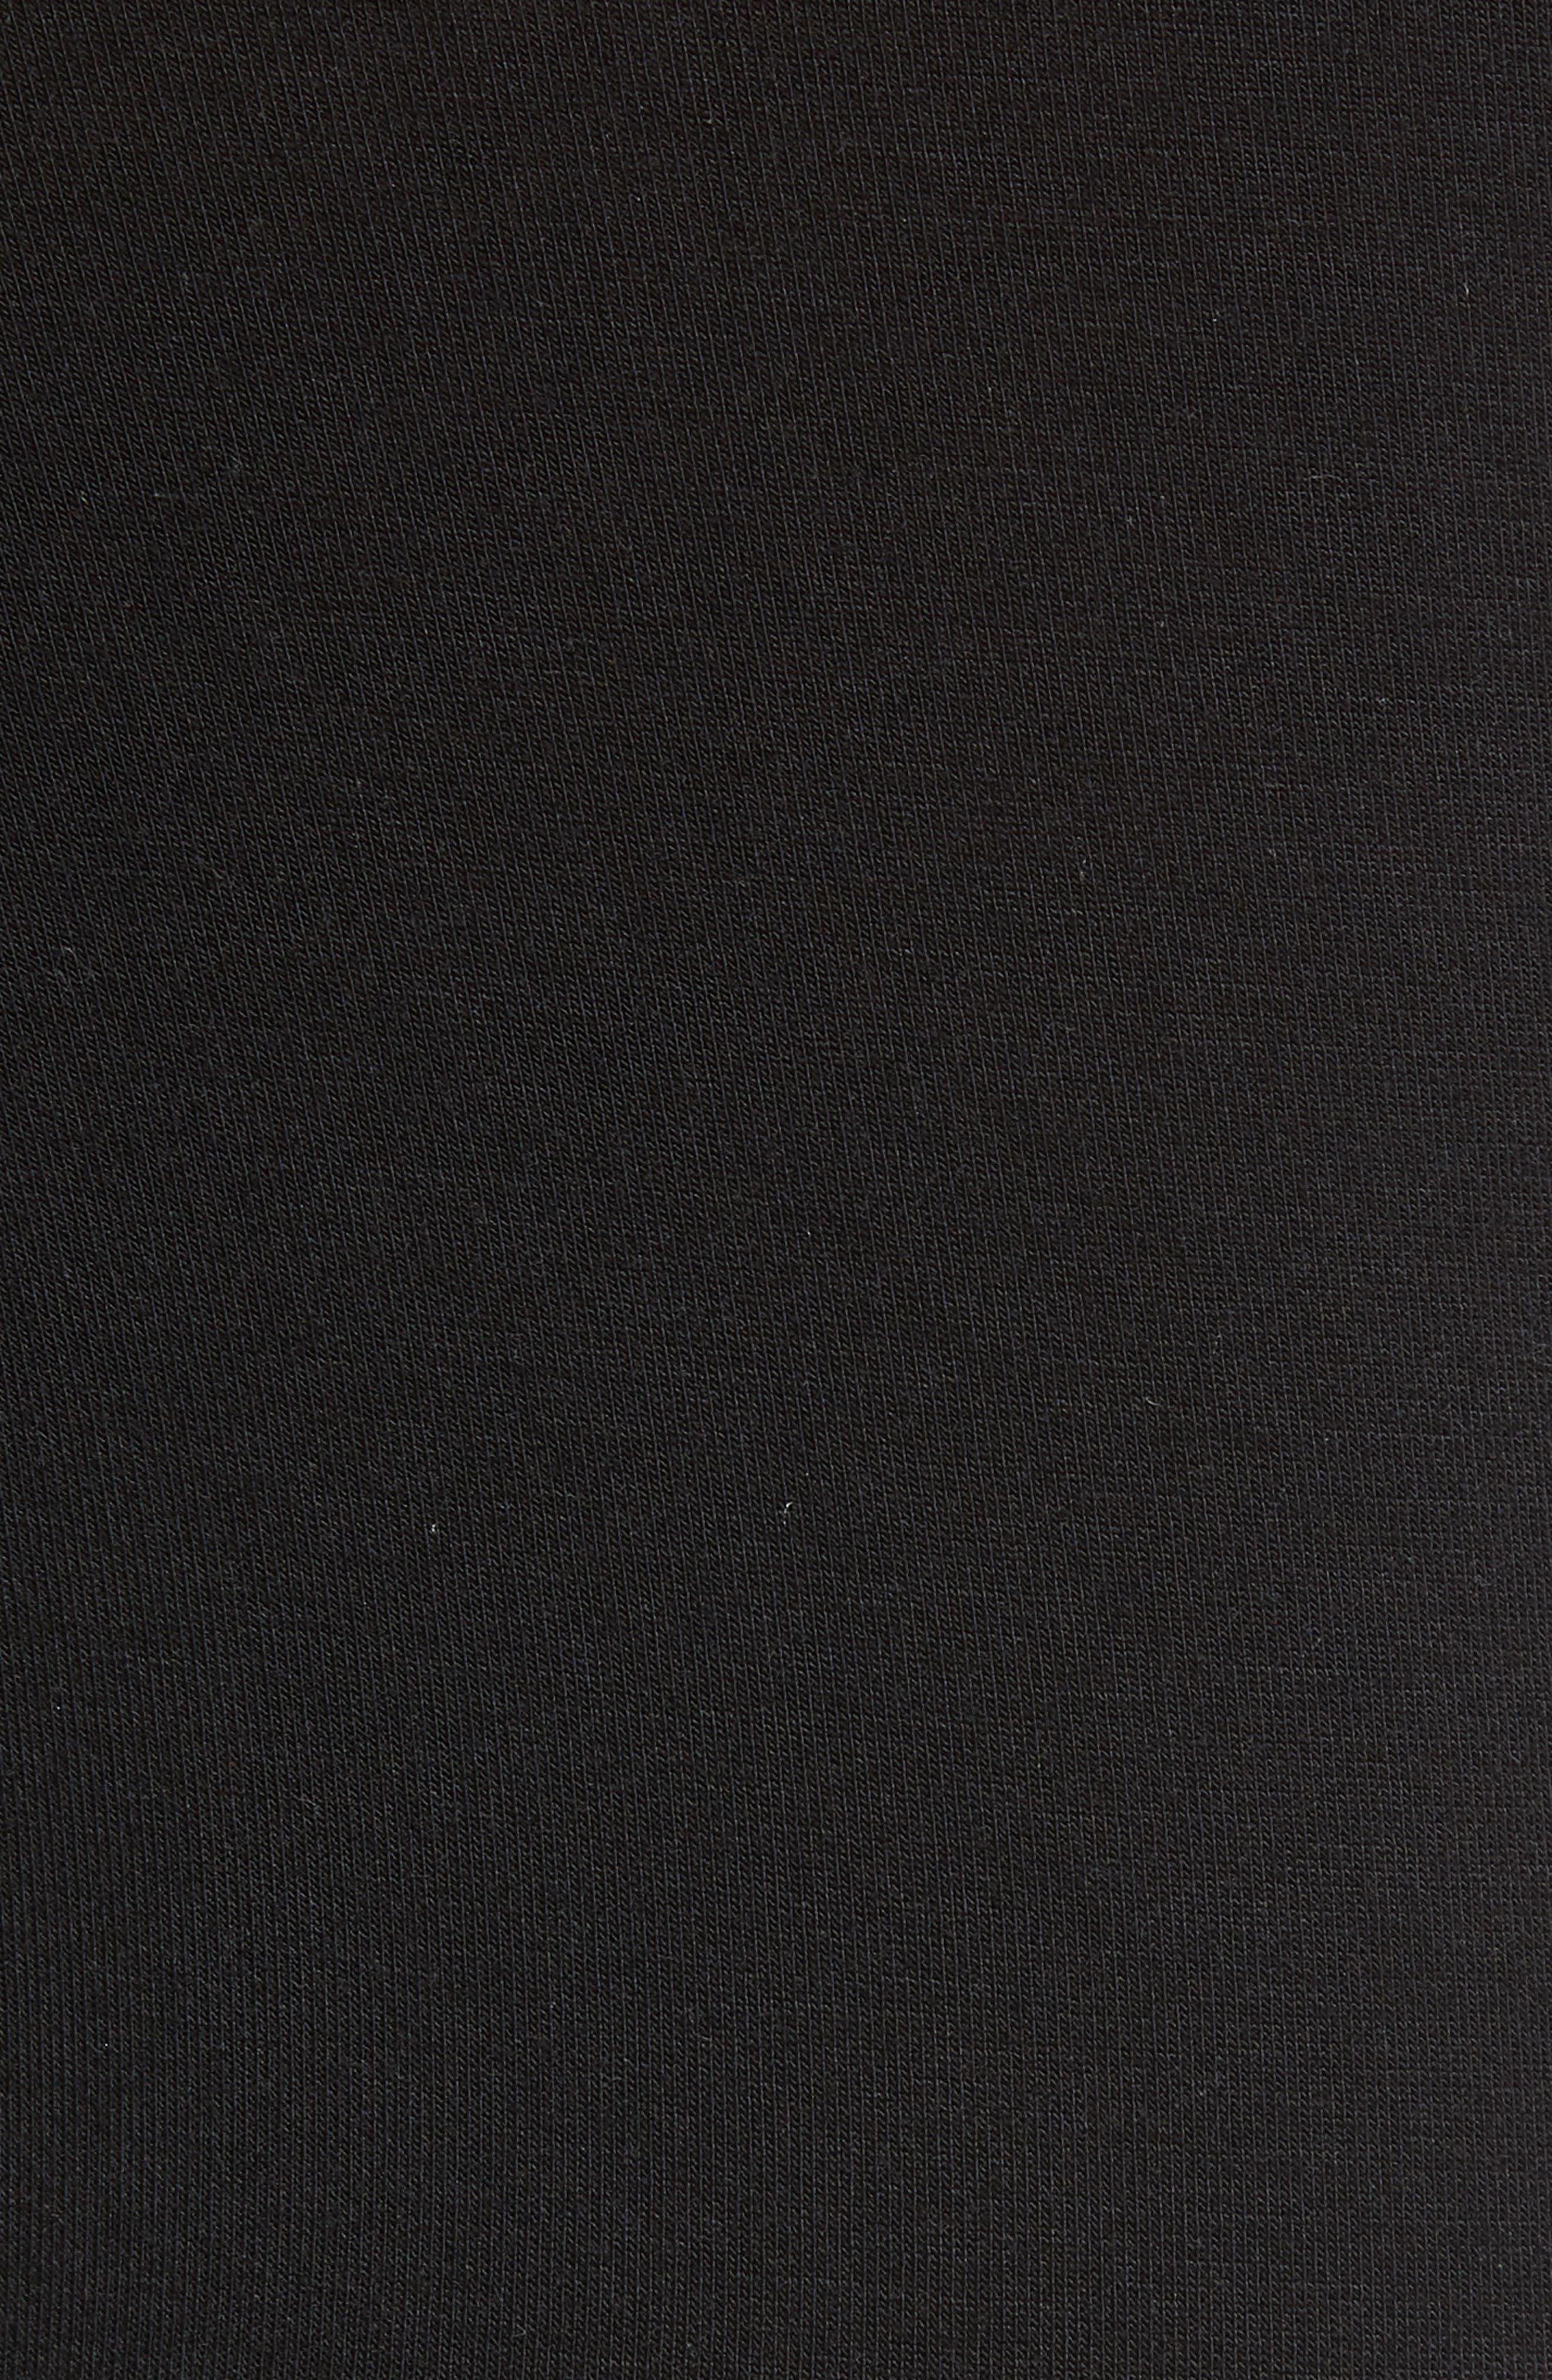 Vibe Modern Fit Boxer Brief,                             Alternate thumbnail 5, color,                             BLACK MULTI